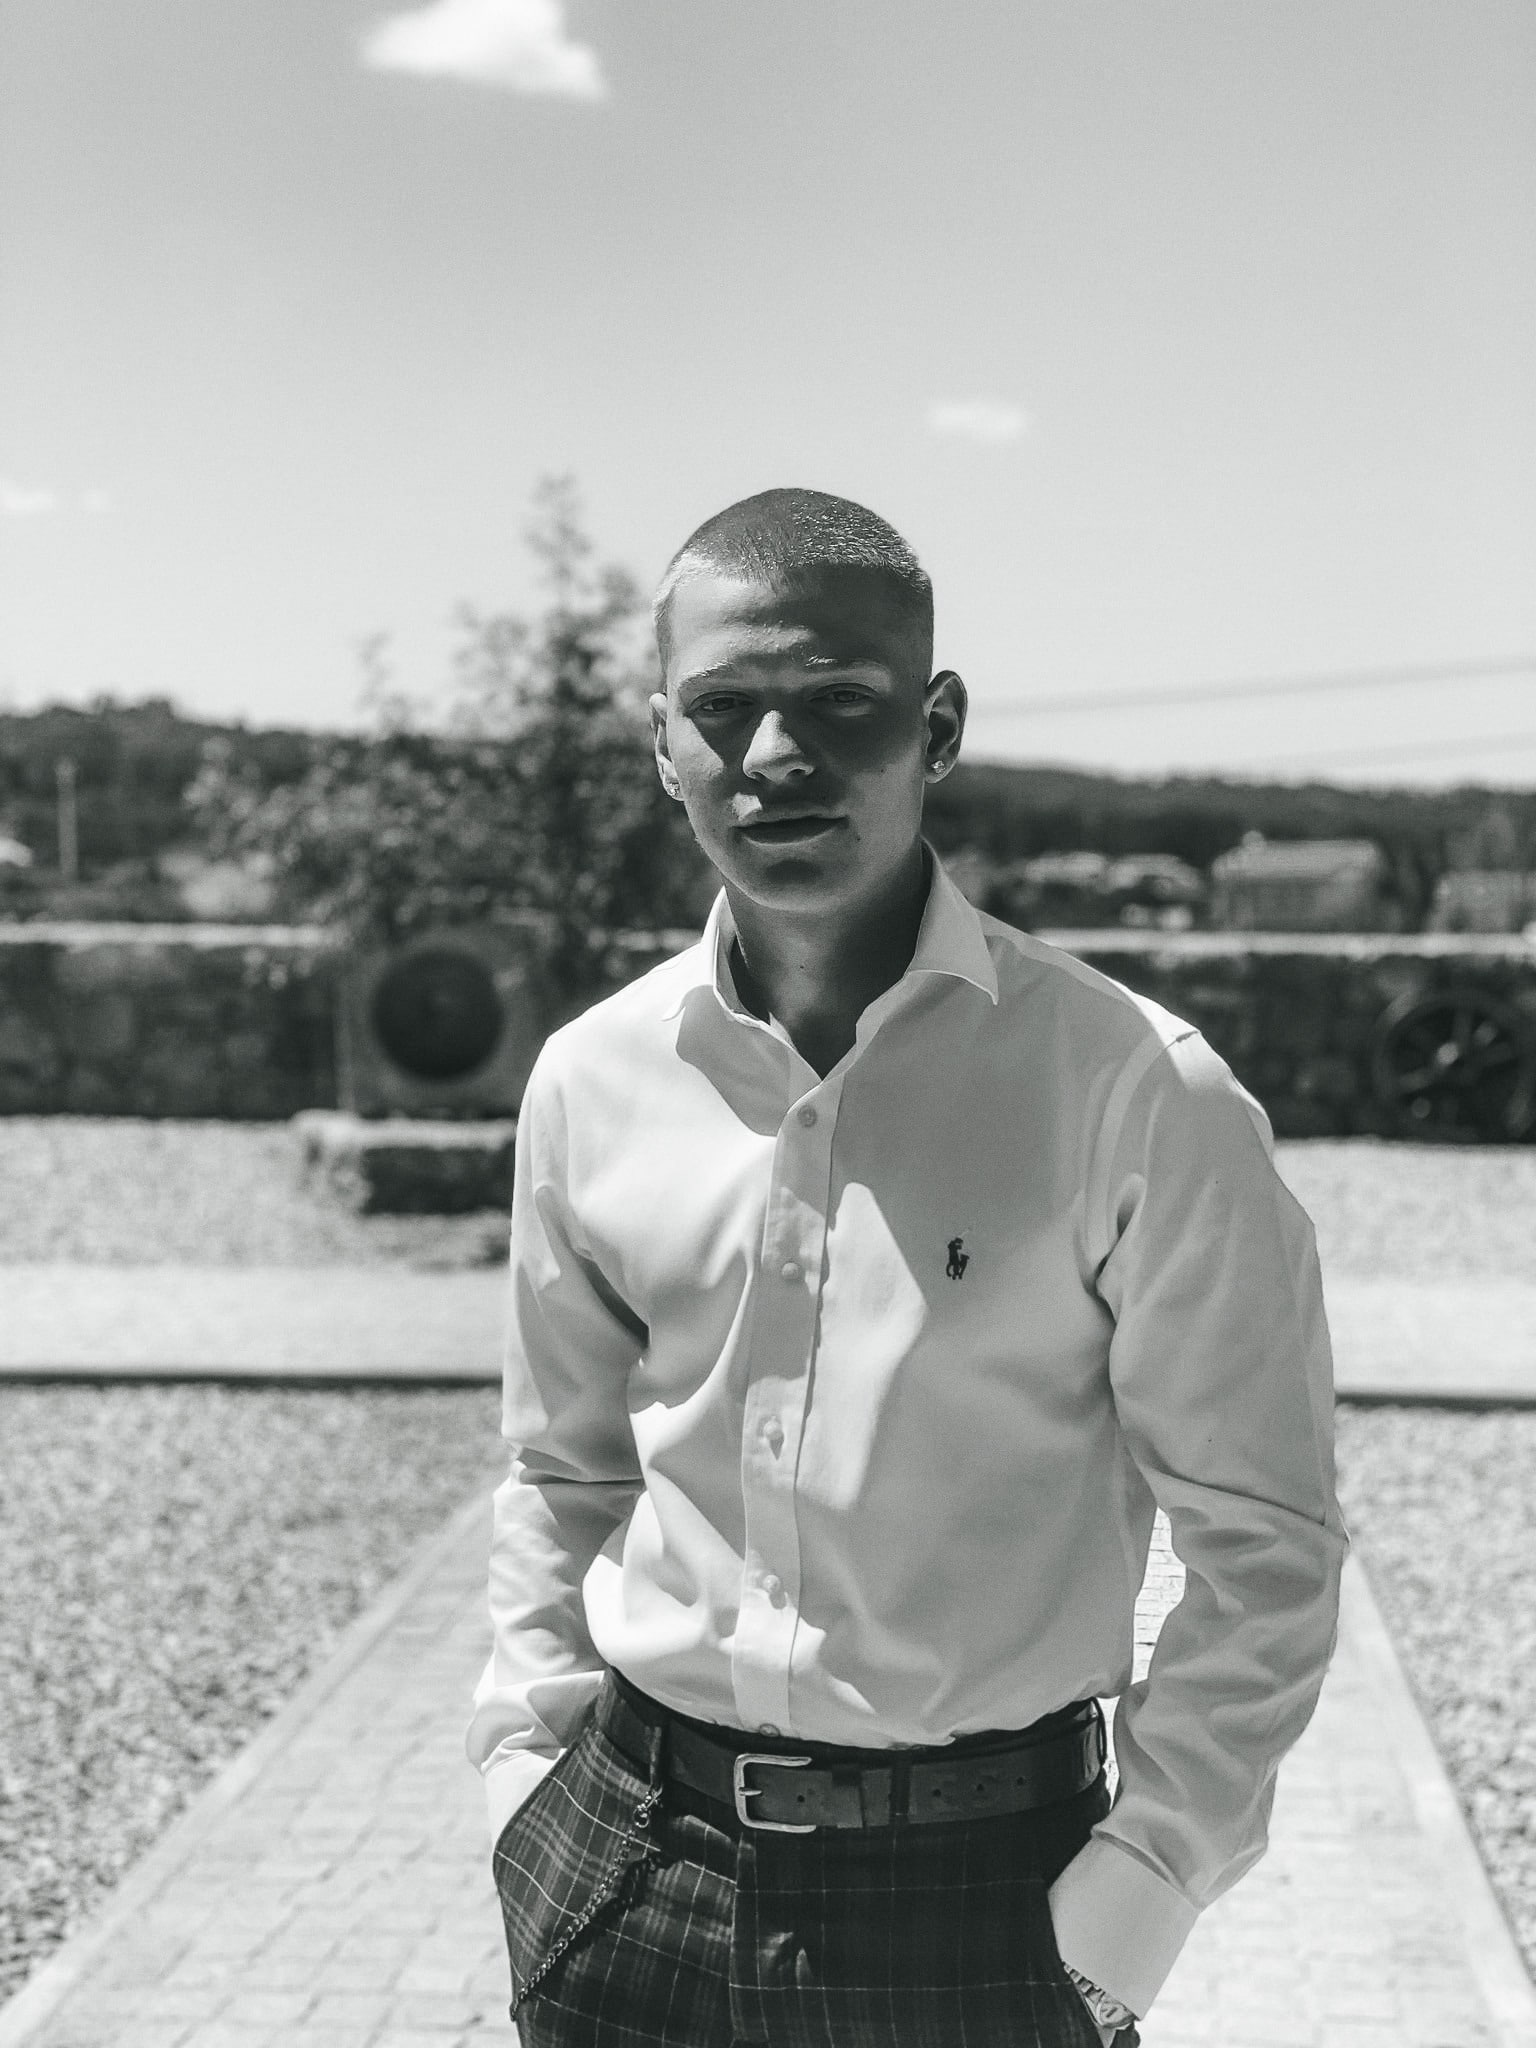 Luis Huwyler